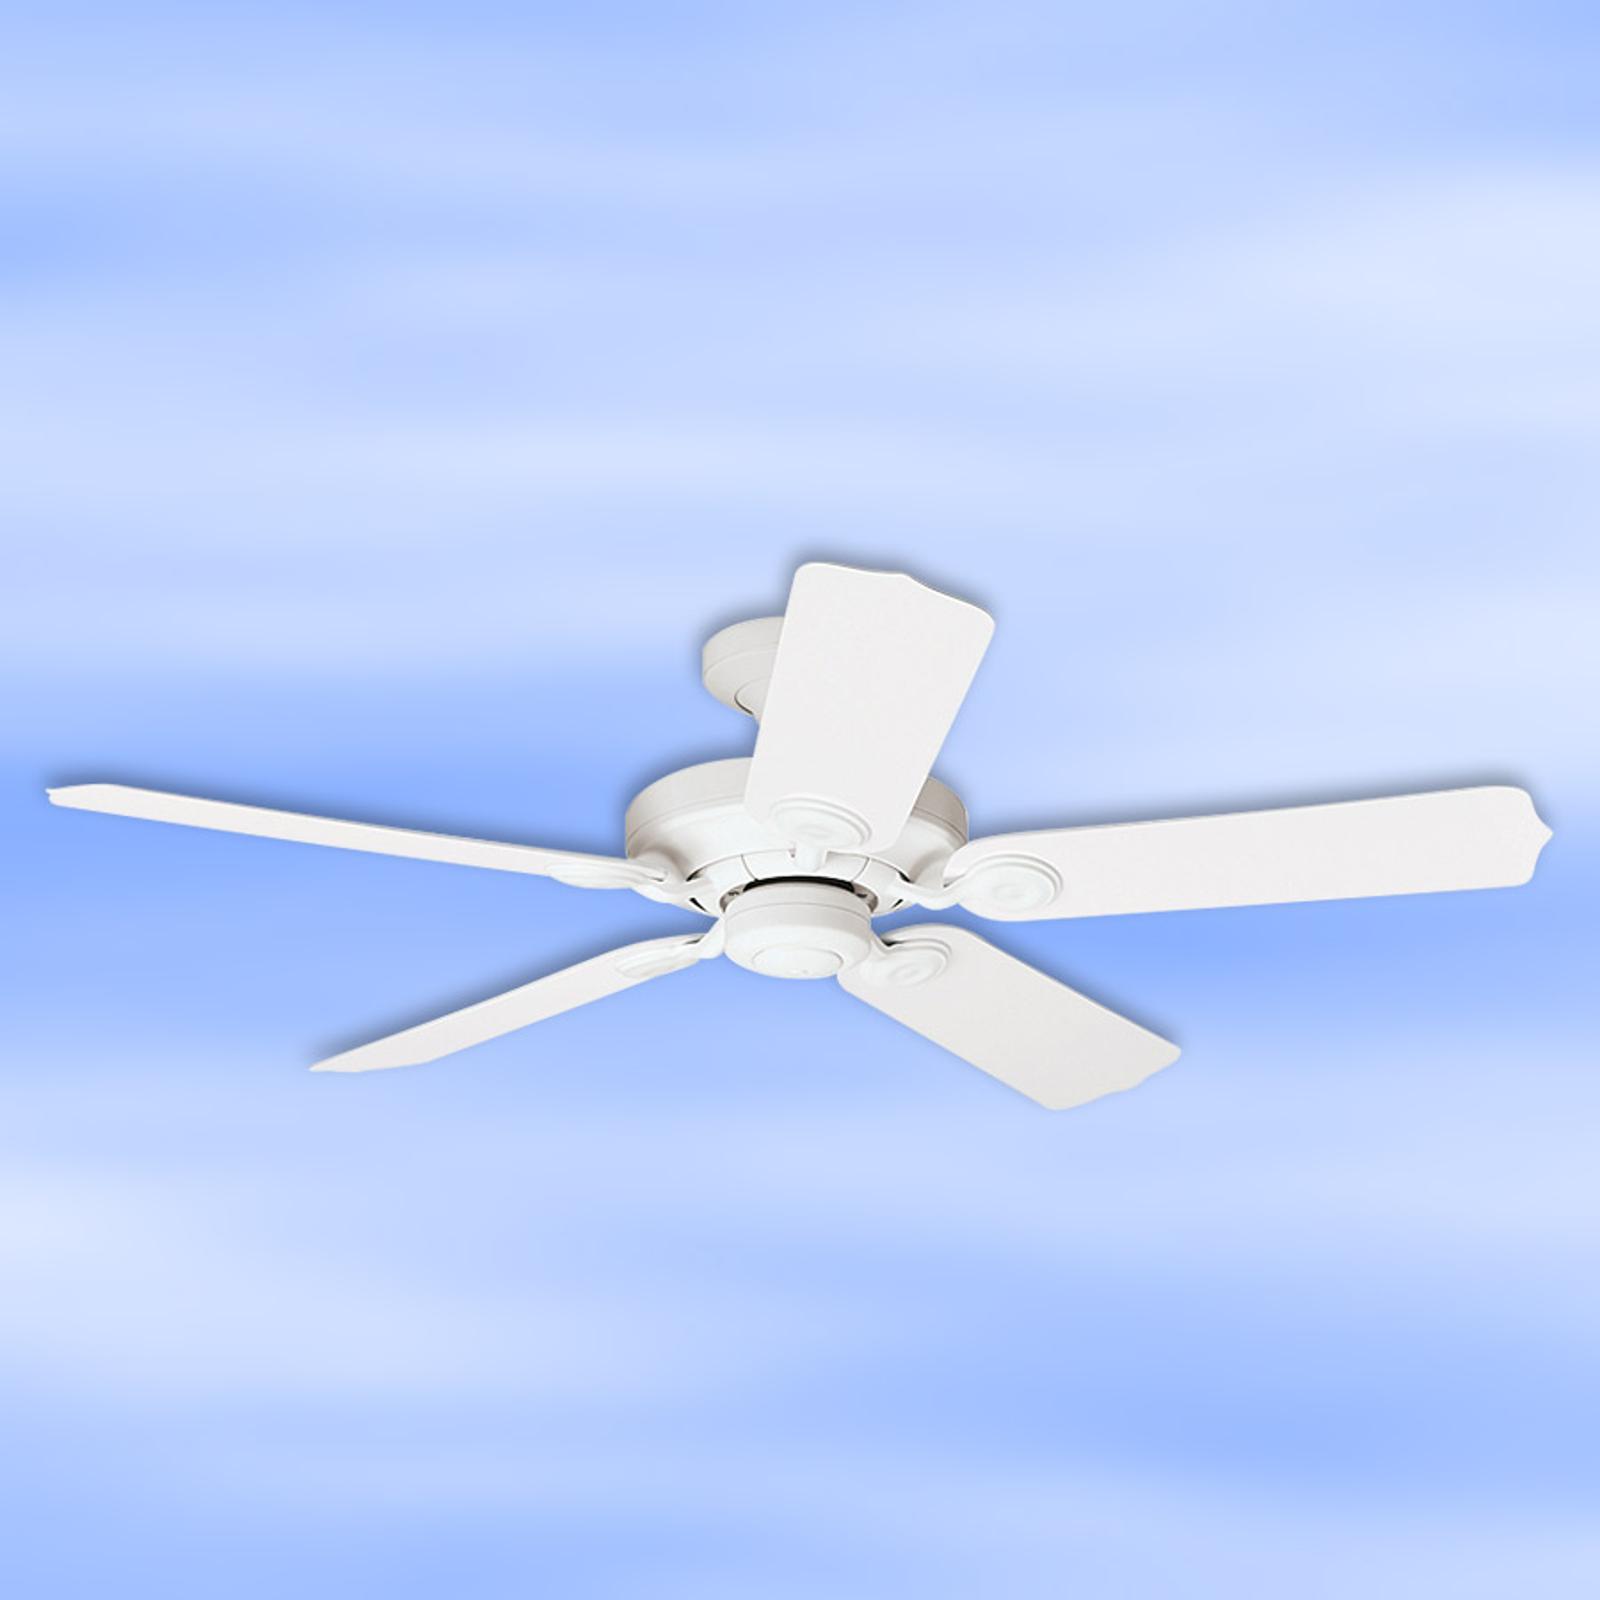 Hvid loftsventilator Outdoor Elements IP44